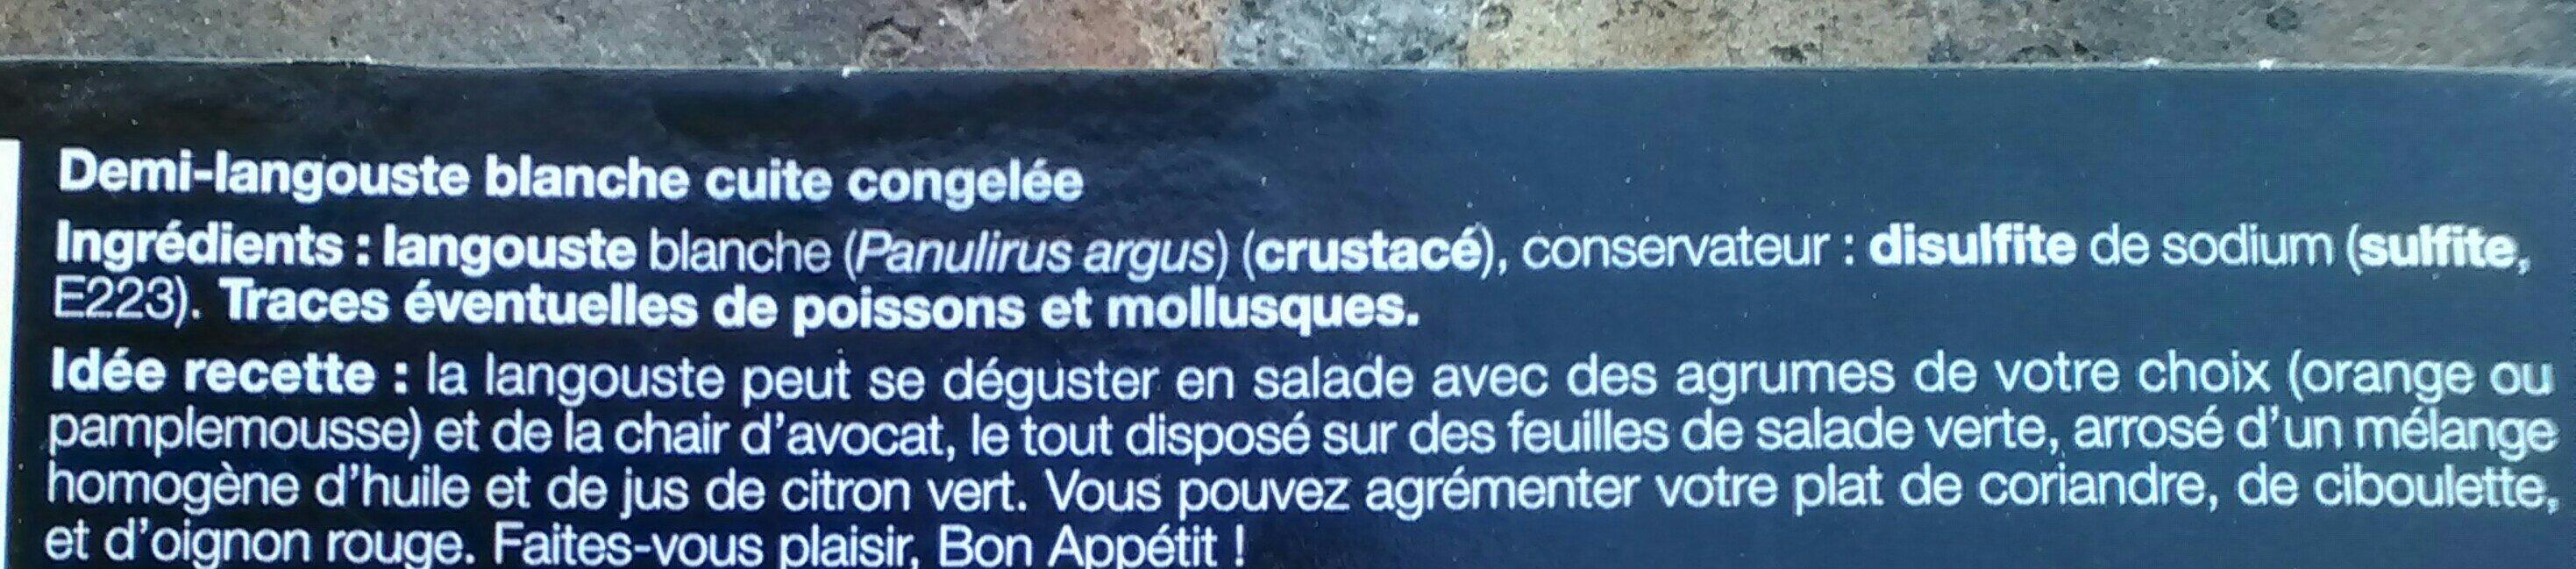 Langouste blanche des Caraïbes - Ingrediënten